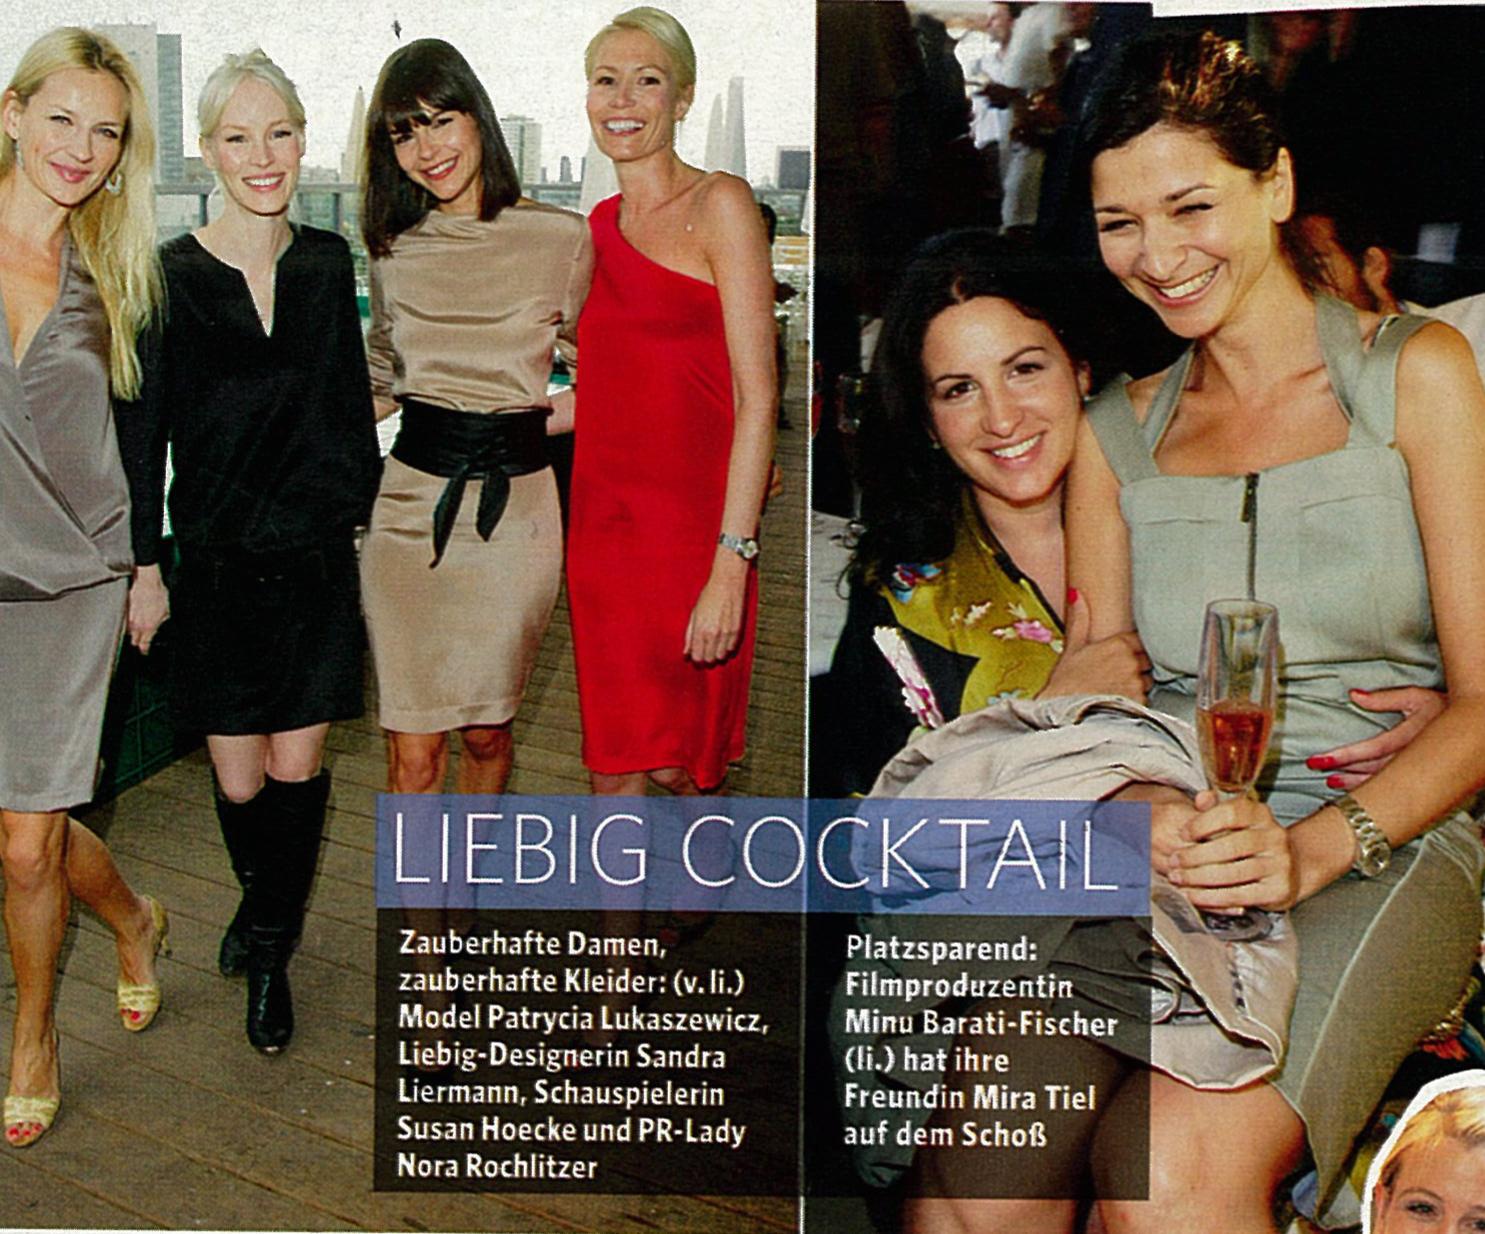 In - Das Starmagazin Nr. 28 / 15.07.10